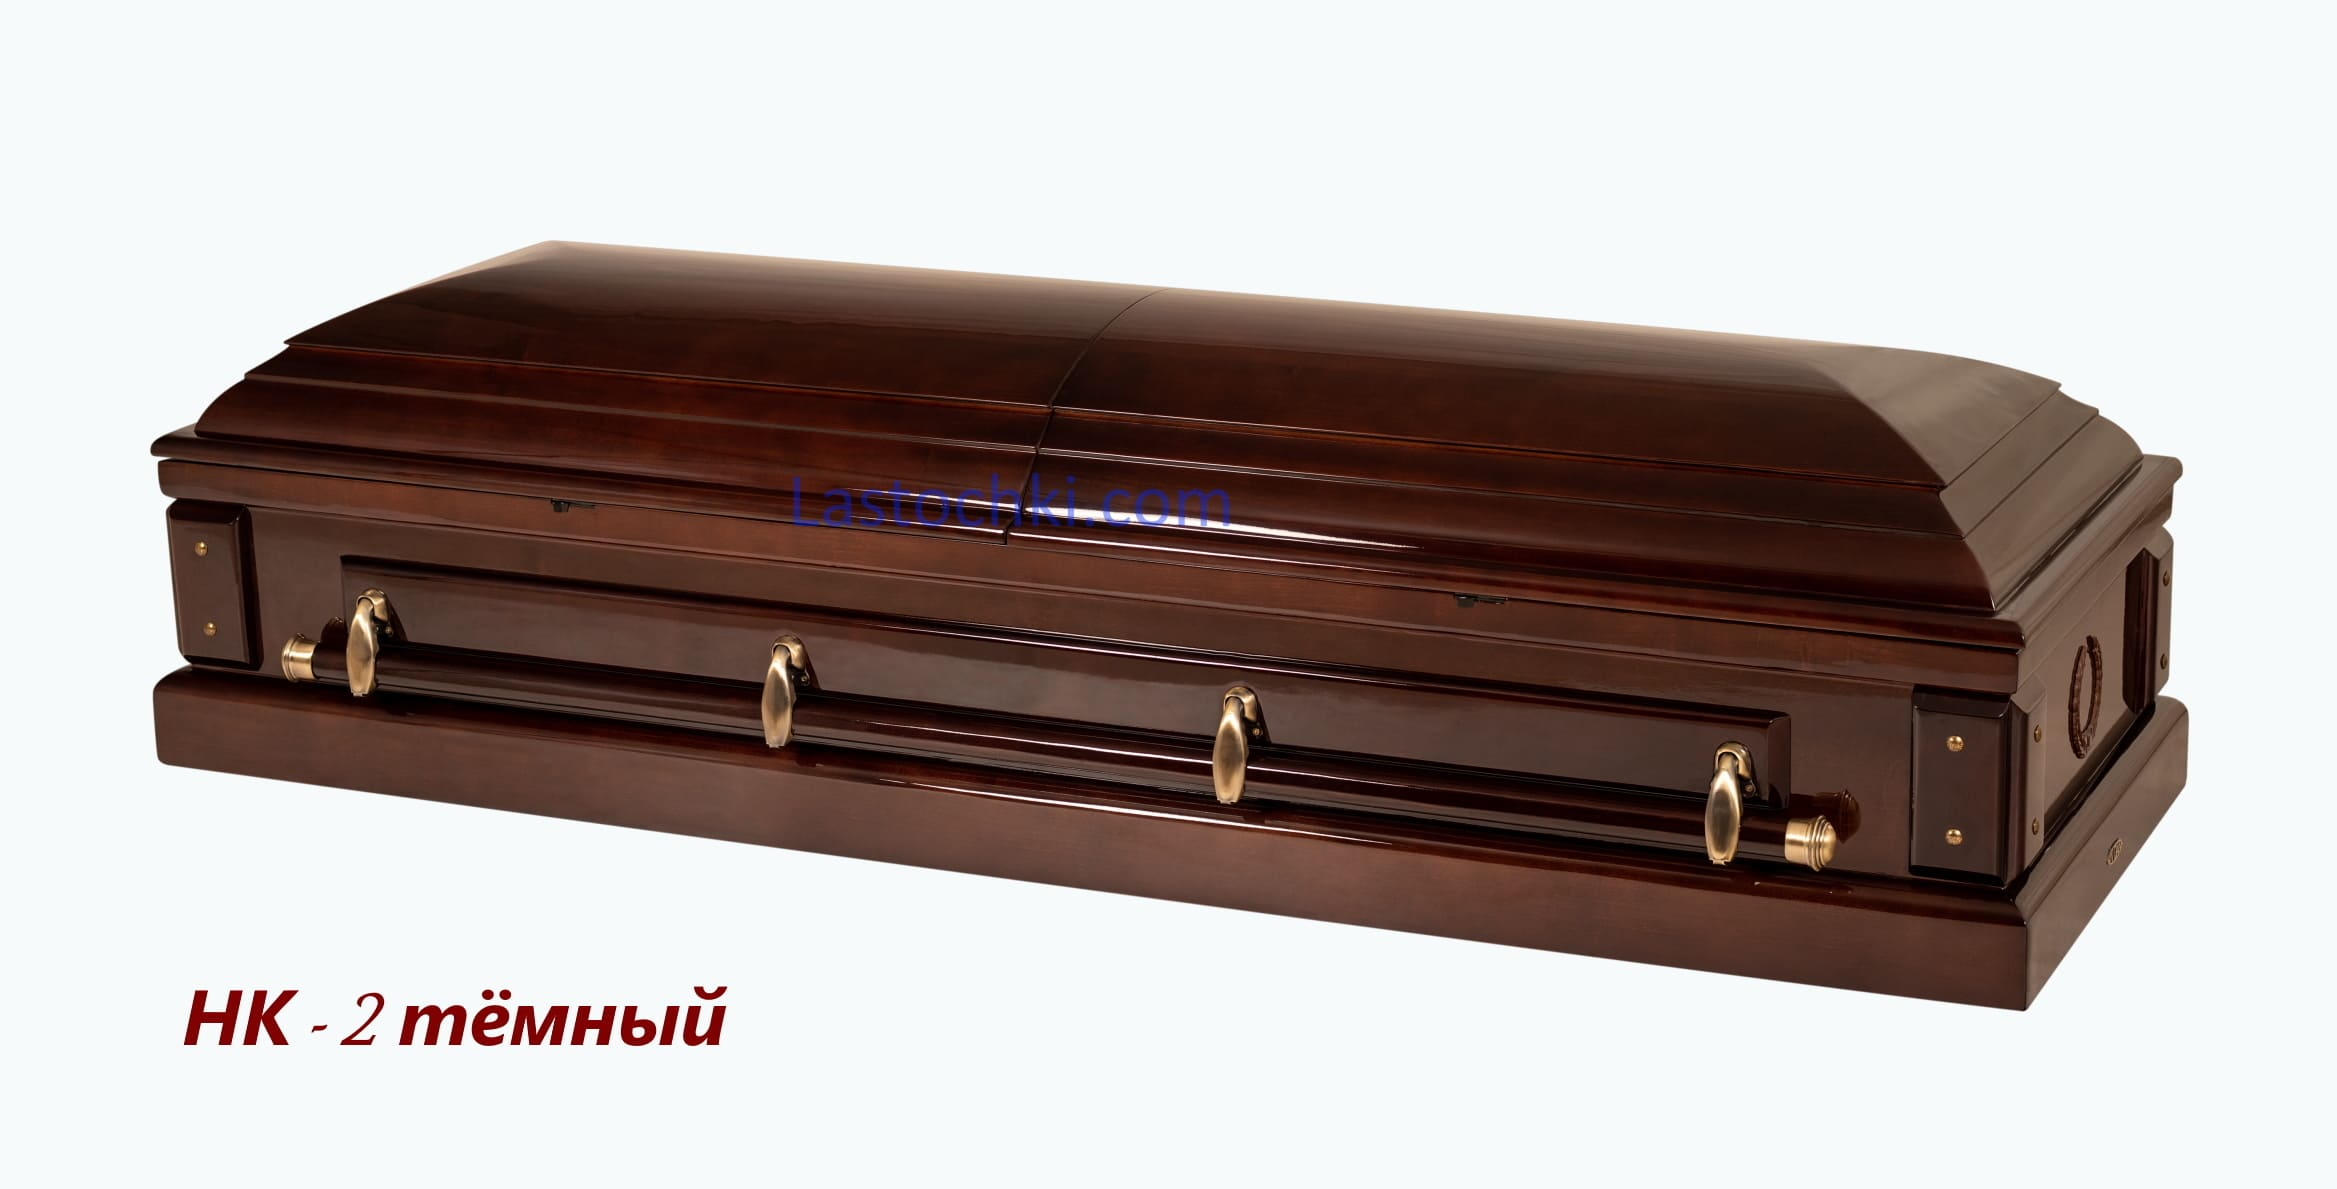 Саркофаг НК - 2 тёмный орех - Цена 33 000 грн.